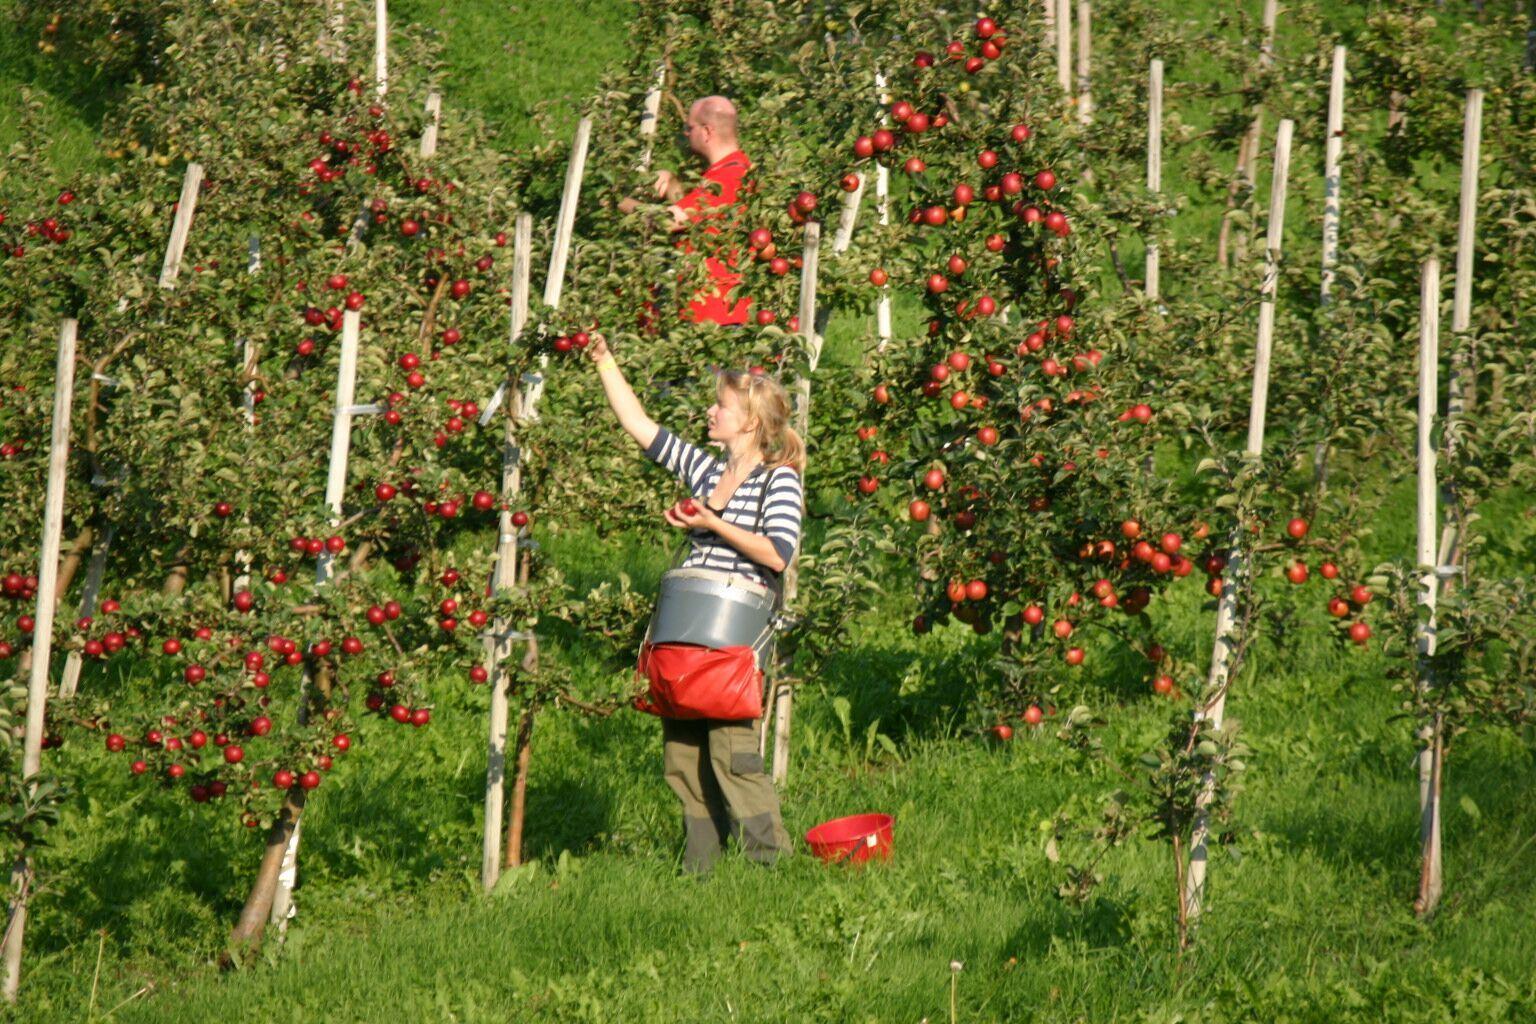 © Anne Marie Øydvin, Travel like the locals - picking apples in Hardanger